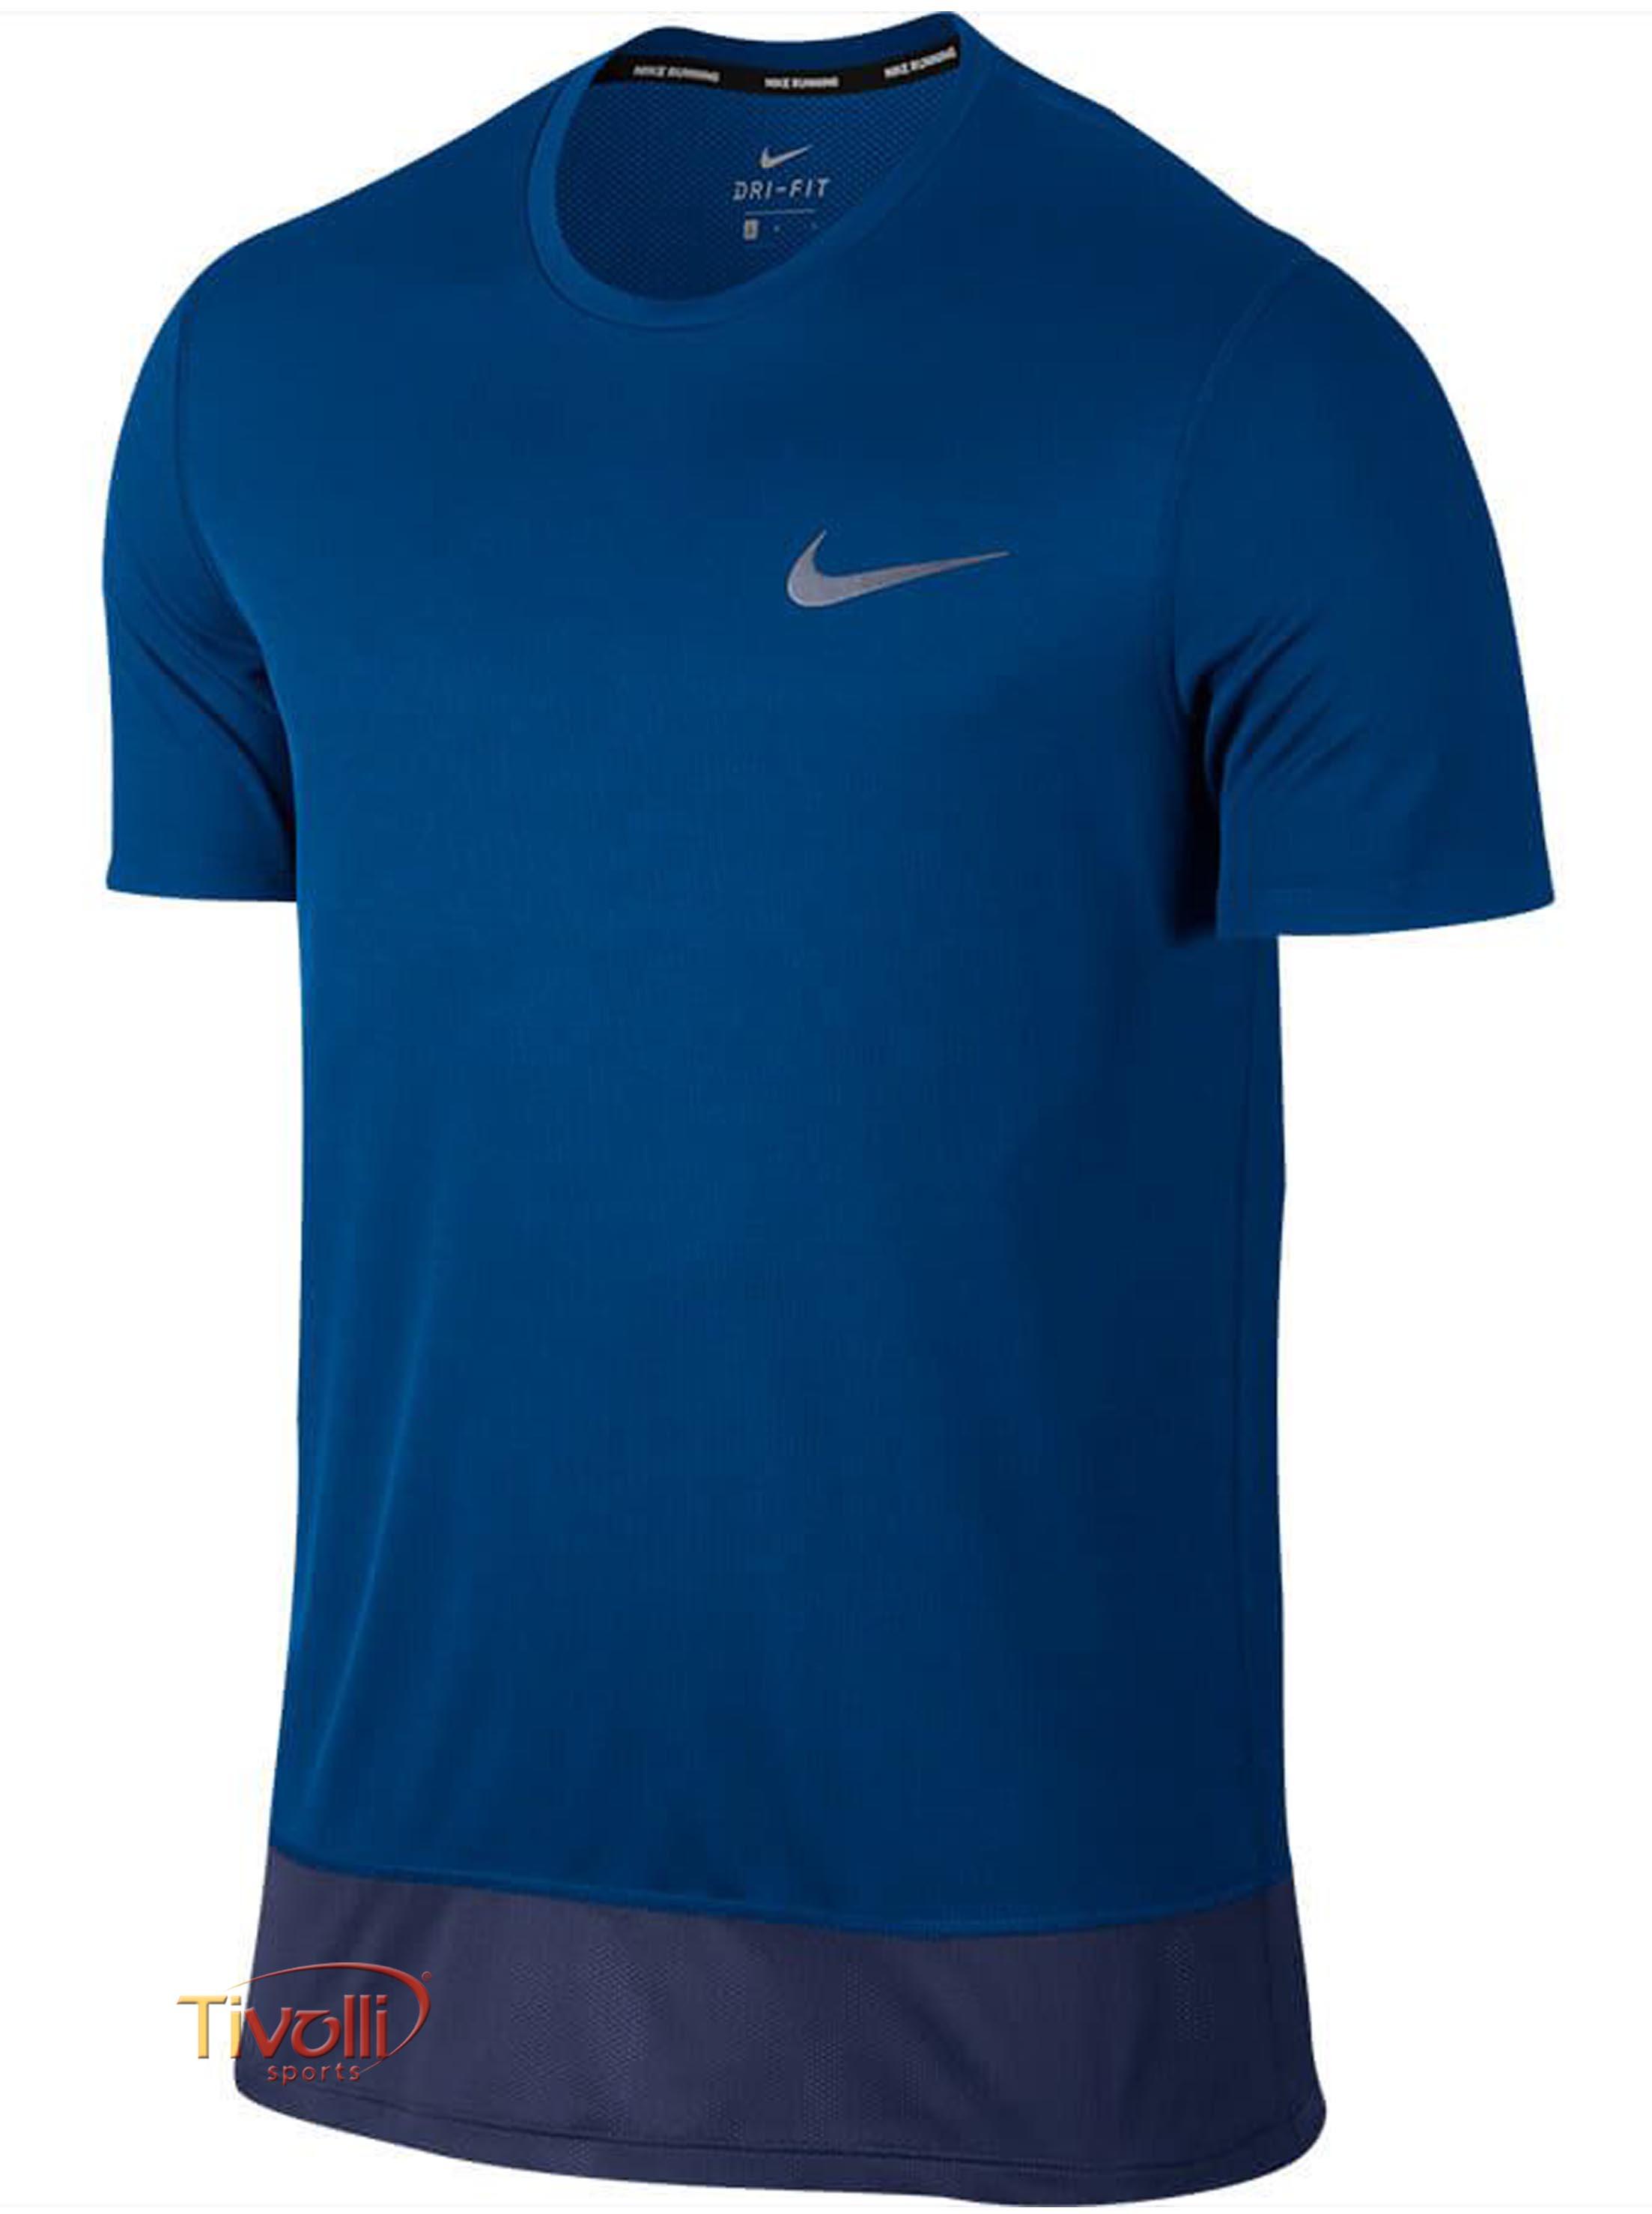 e311959a92adf Camiseta Nike Breathe Rapid   Azul Royal e Marinho